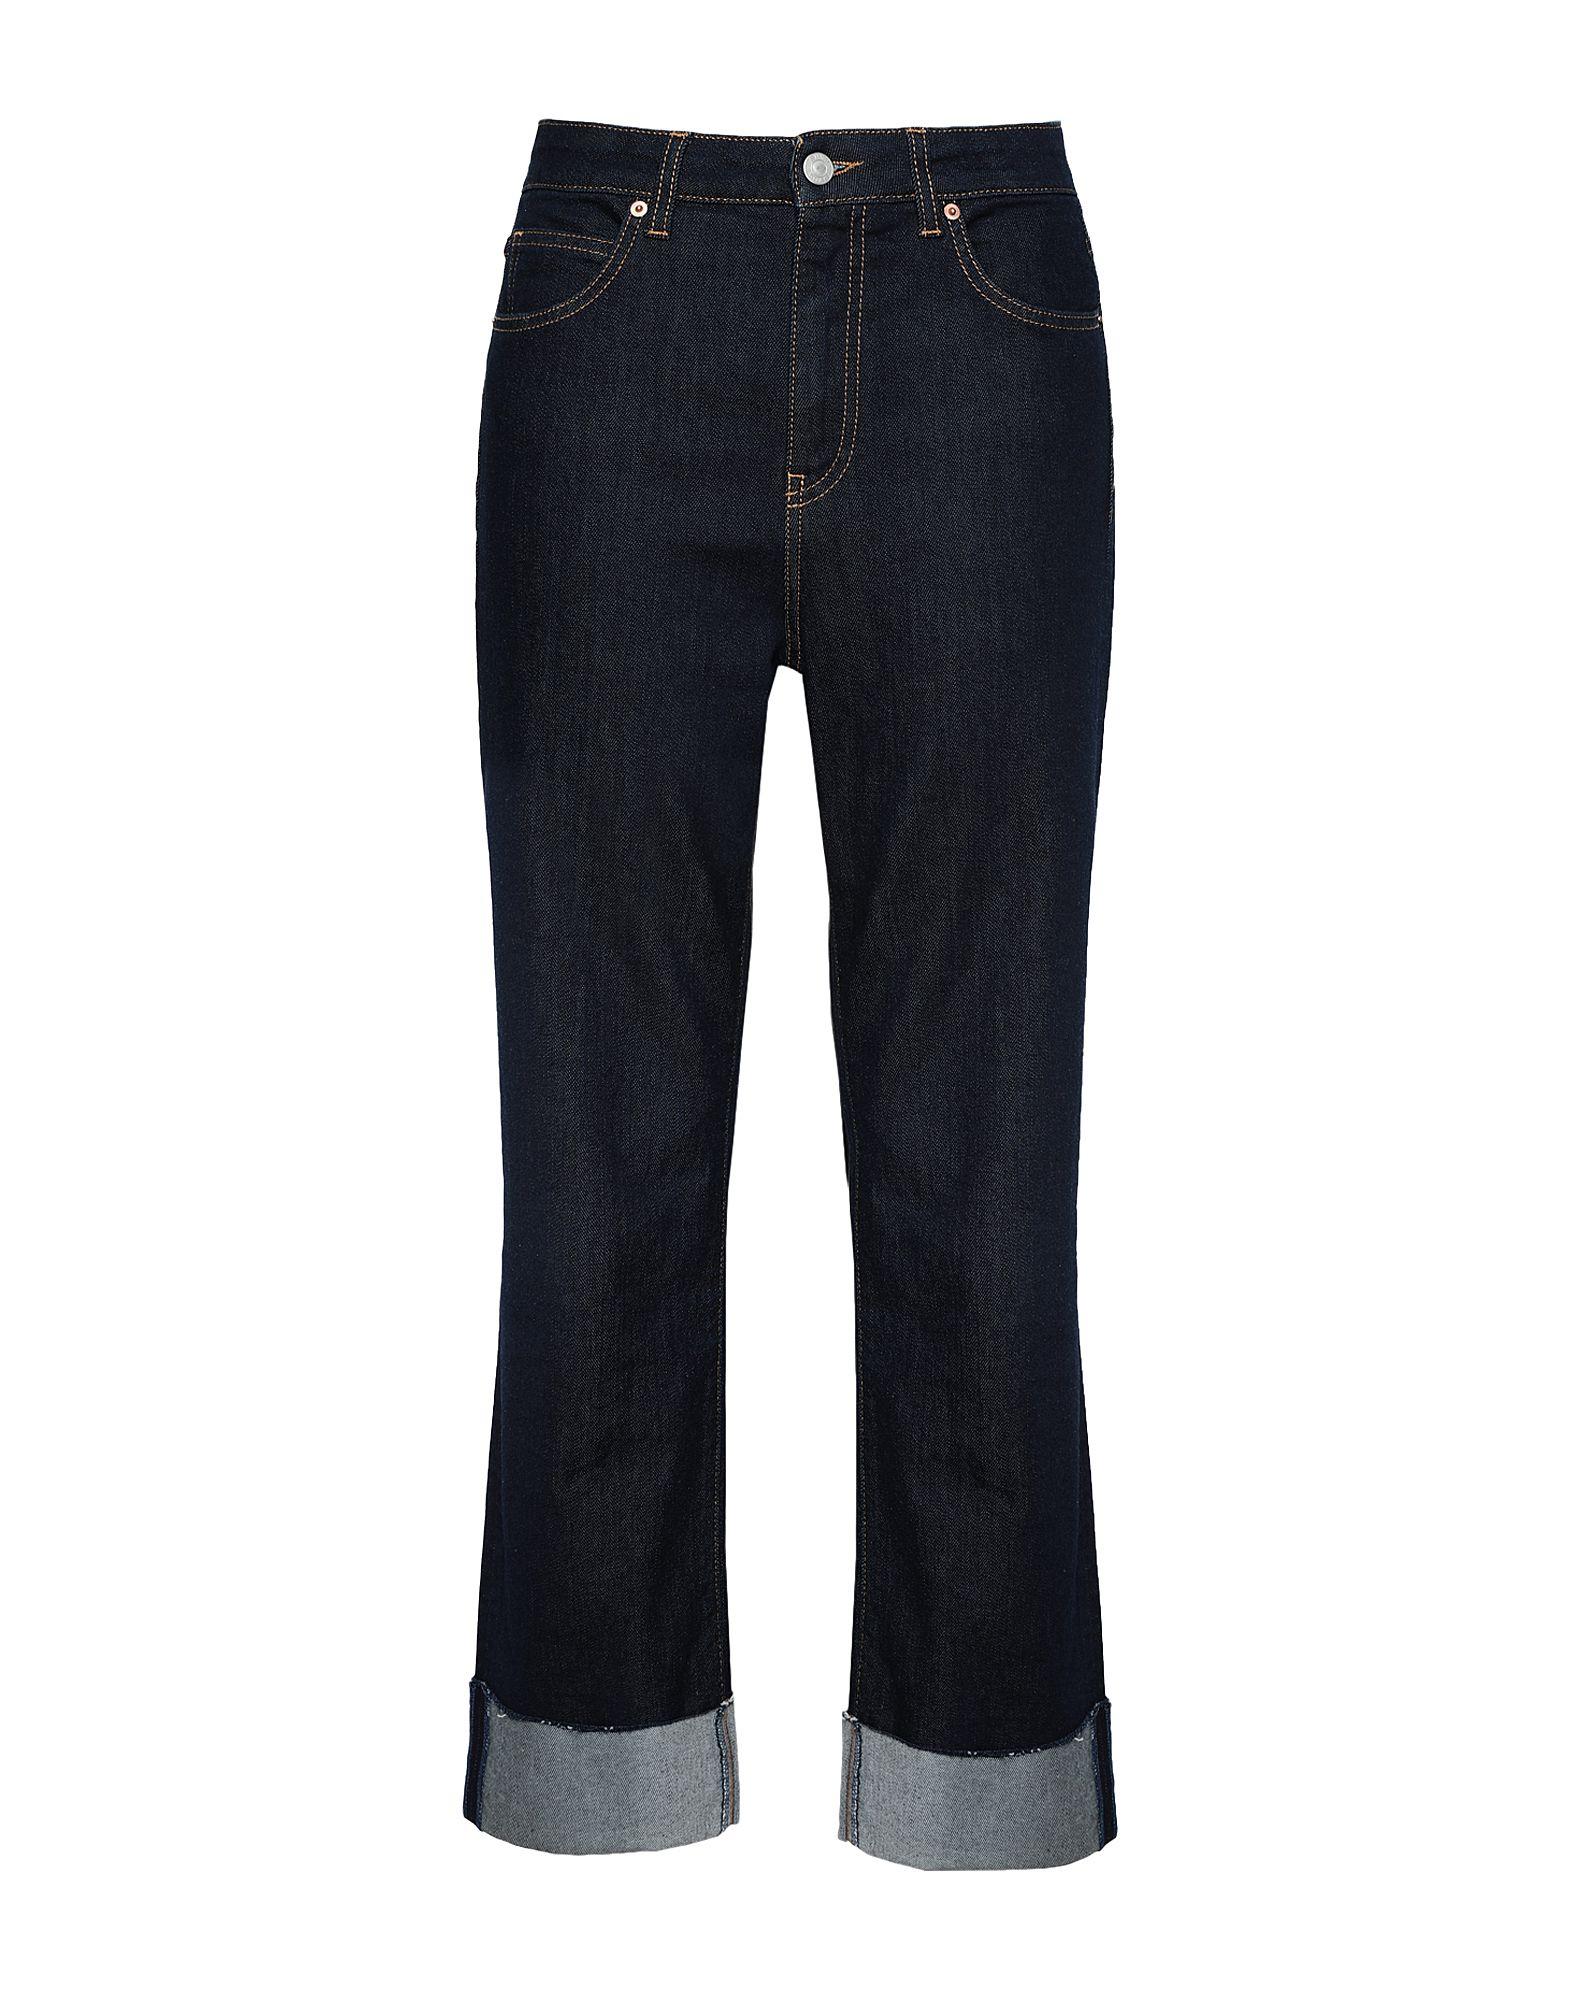 мужские легинсы джинсы